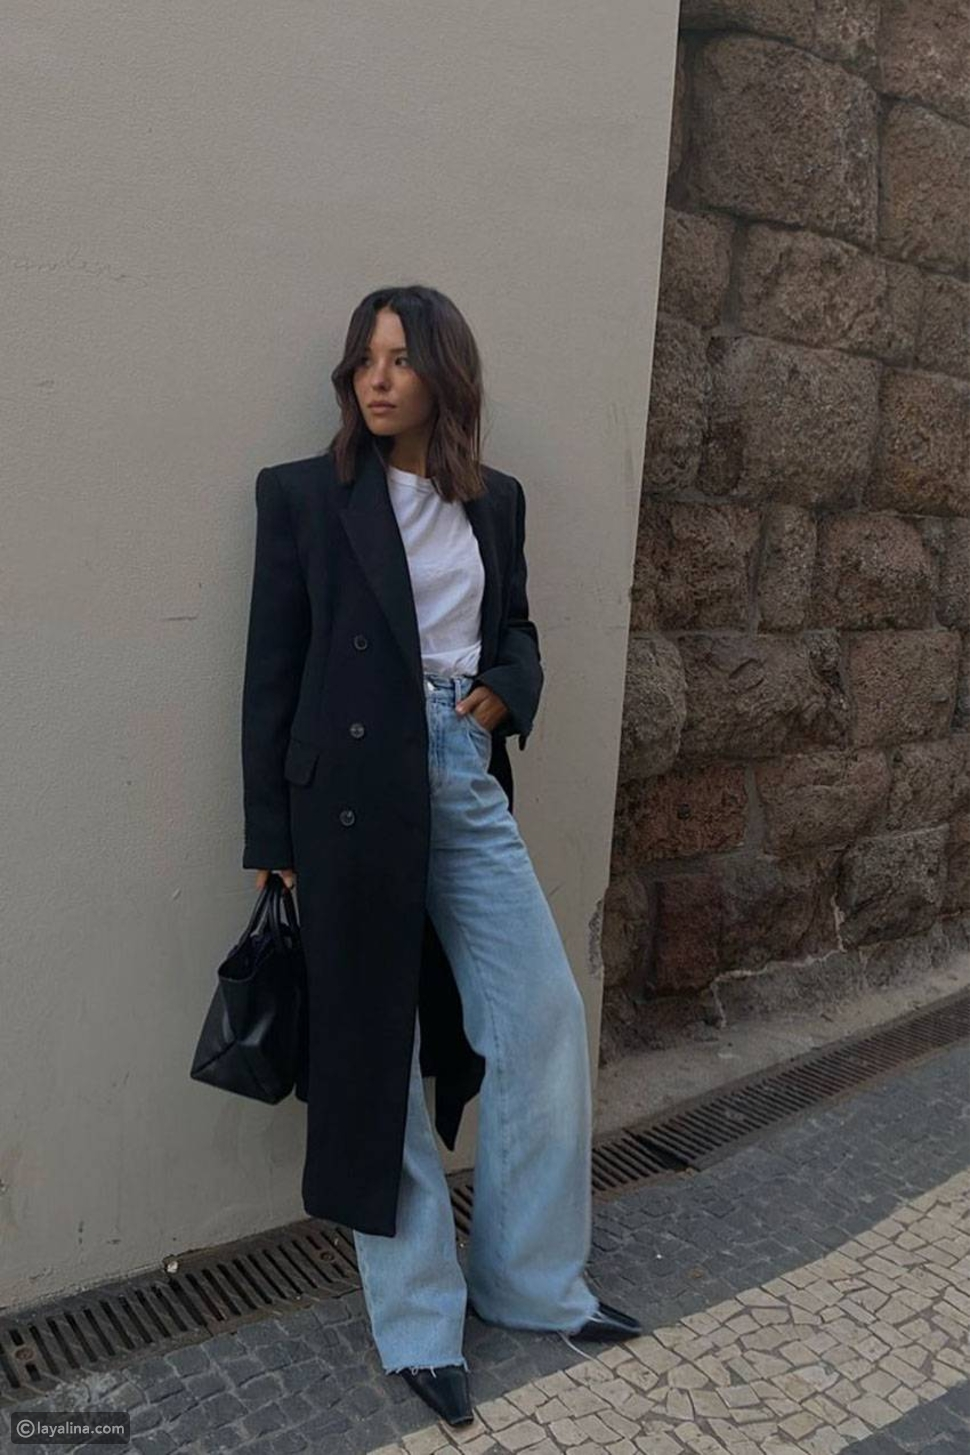 معطف بليزر مع جينز واسع